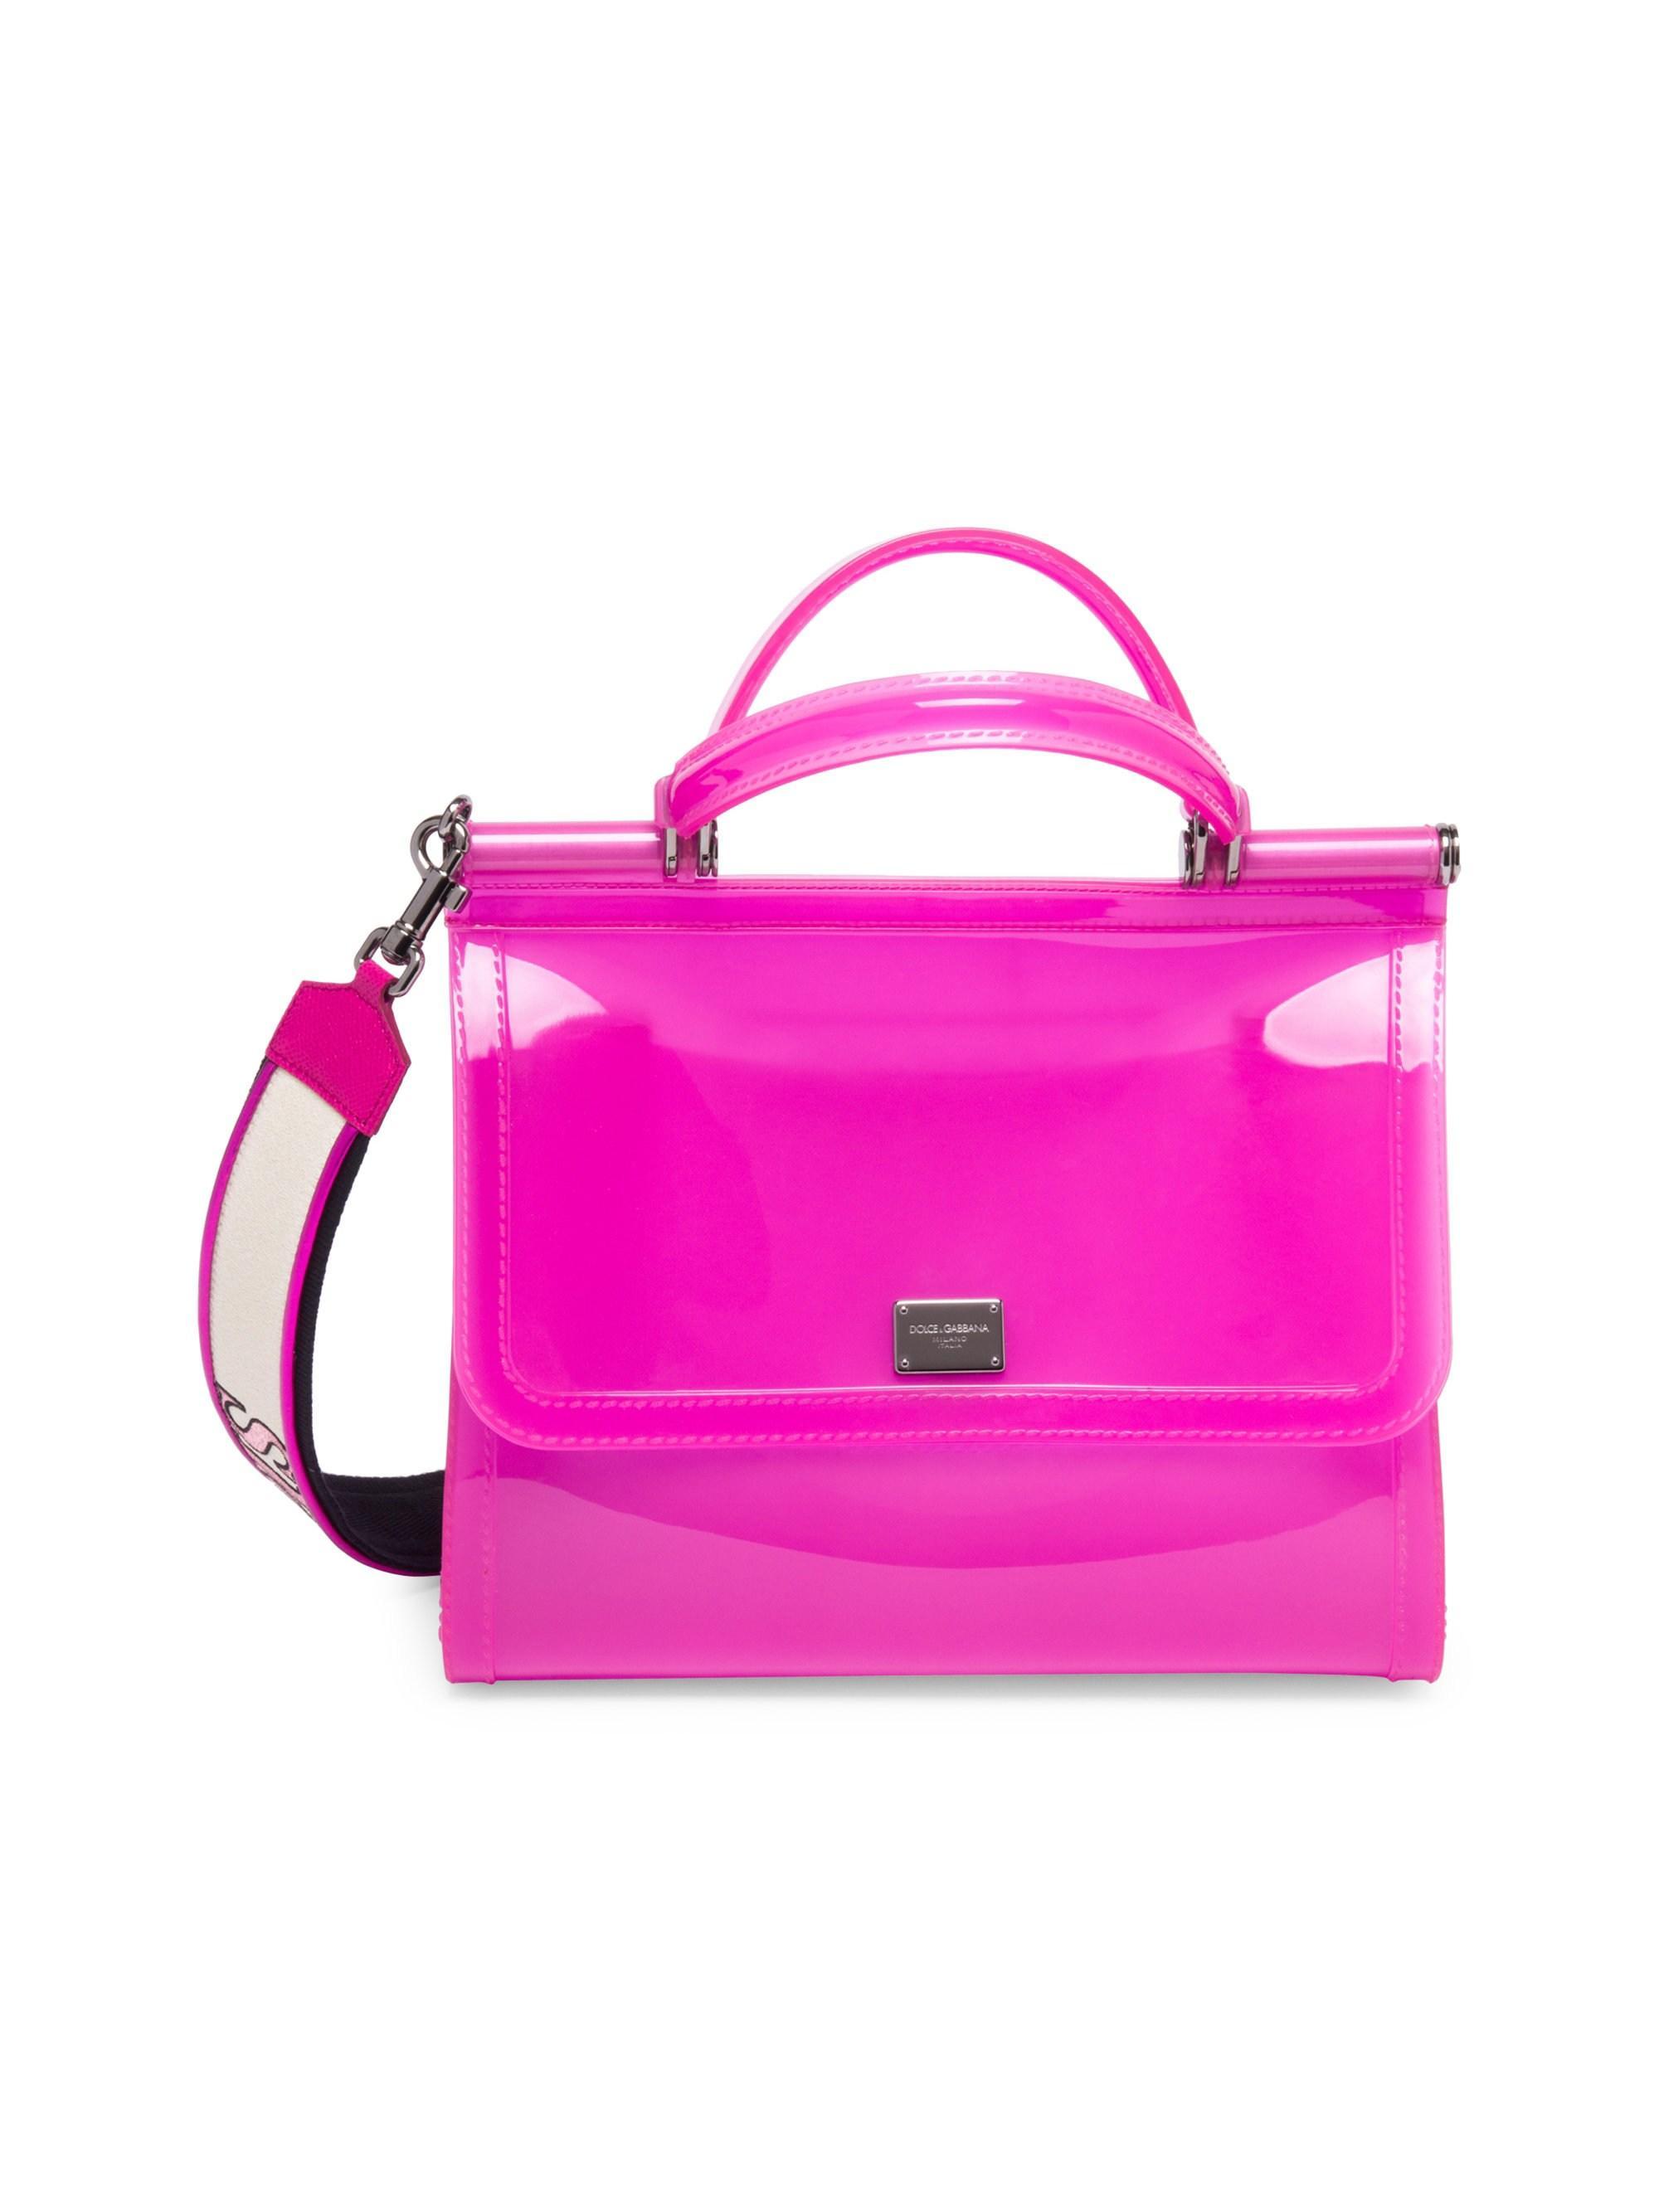 8b4f8ee261 Lyst - Dolce   Gabbana Women s Sicily Pvc Top Handle Bag - Blue in Pink